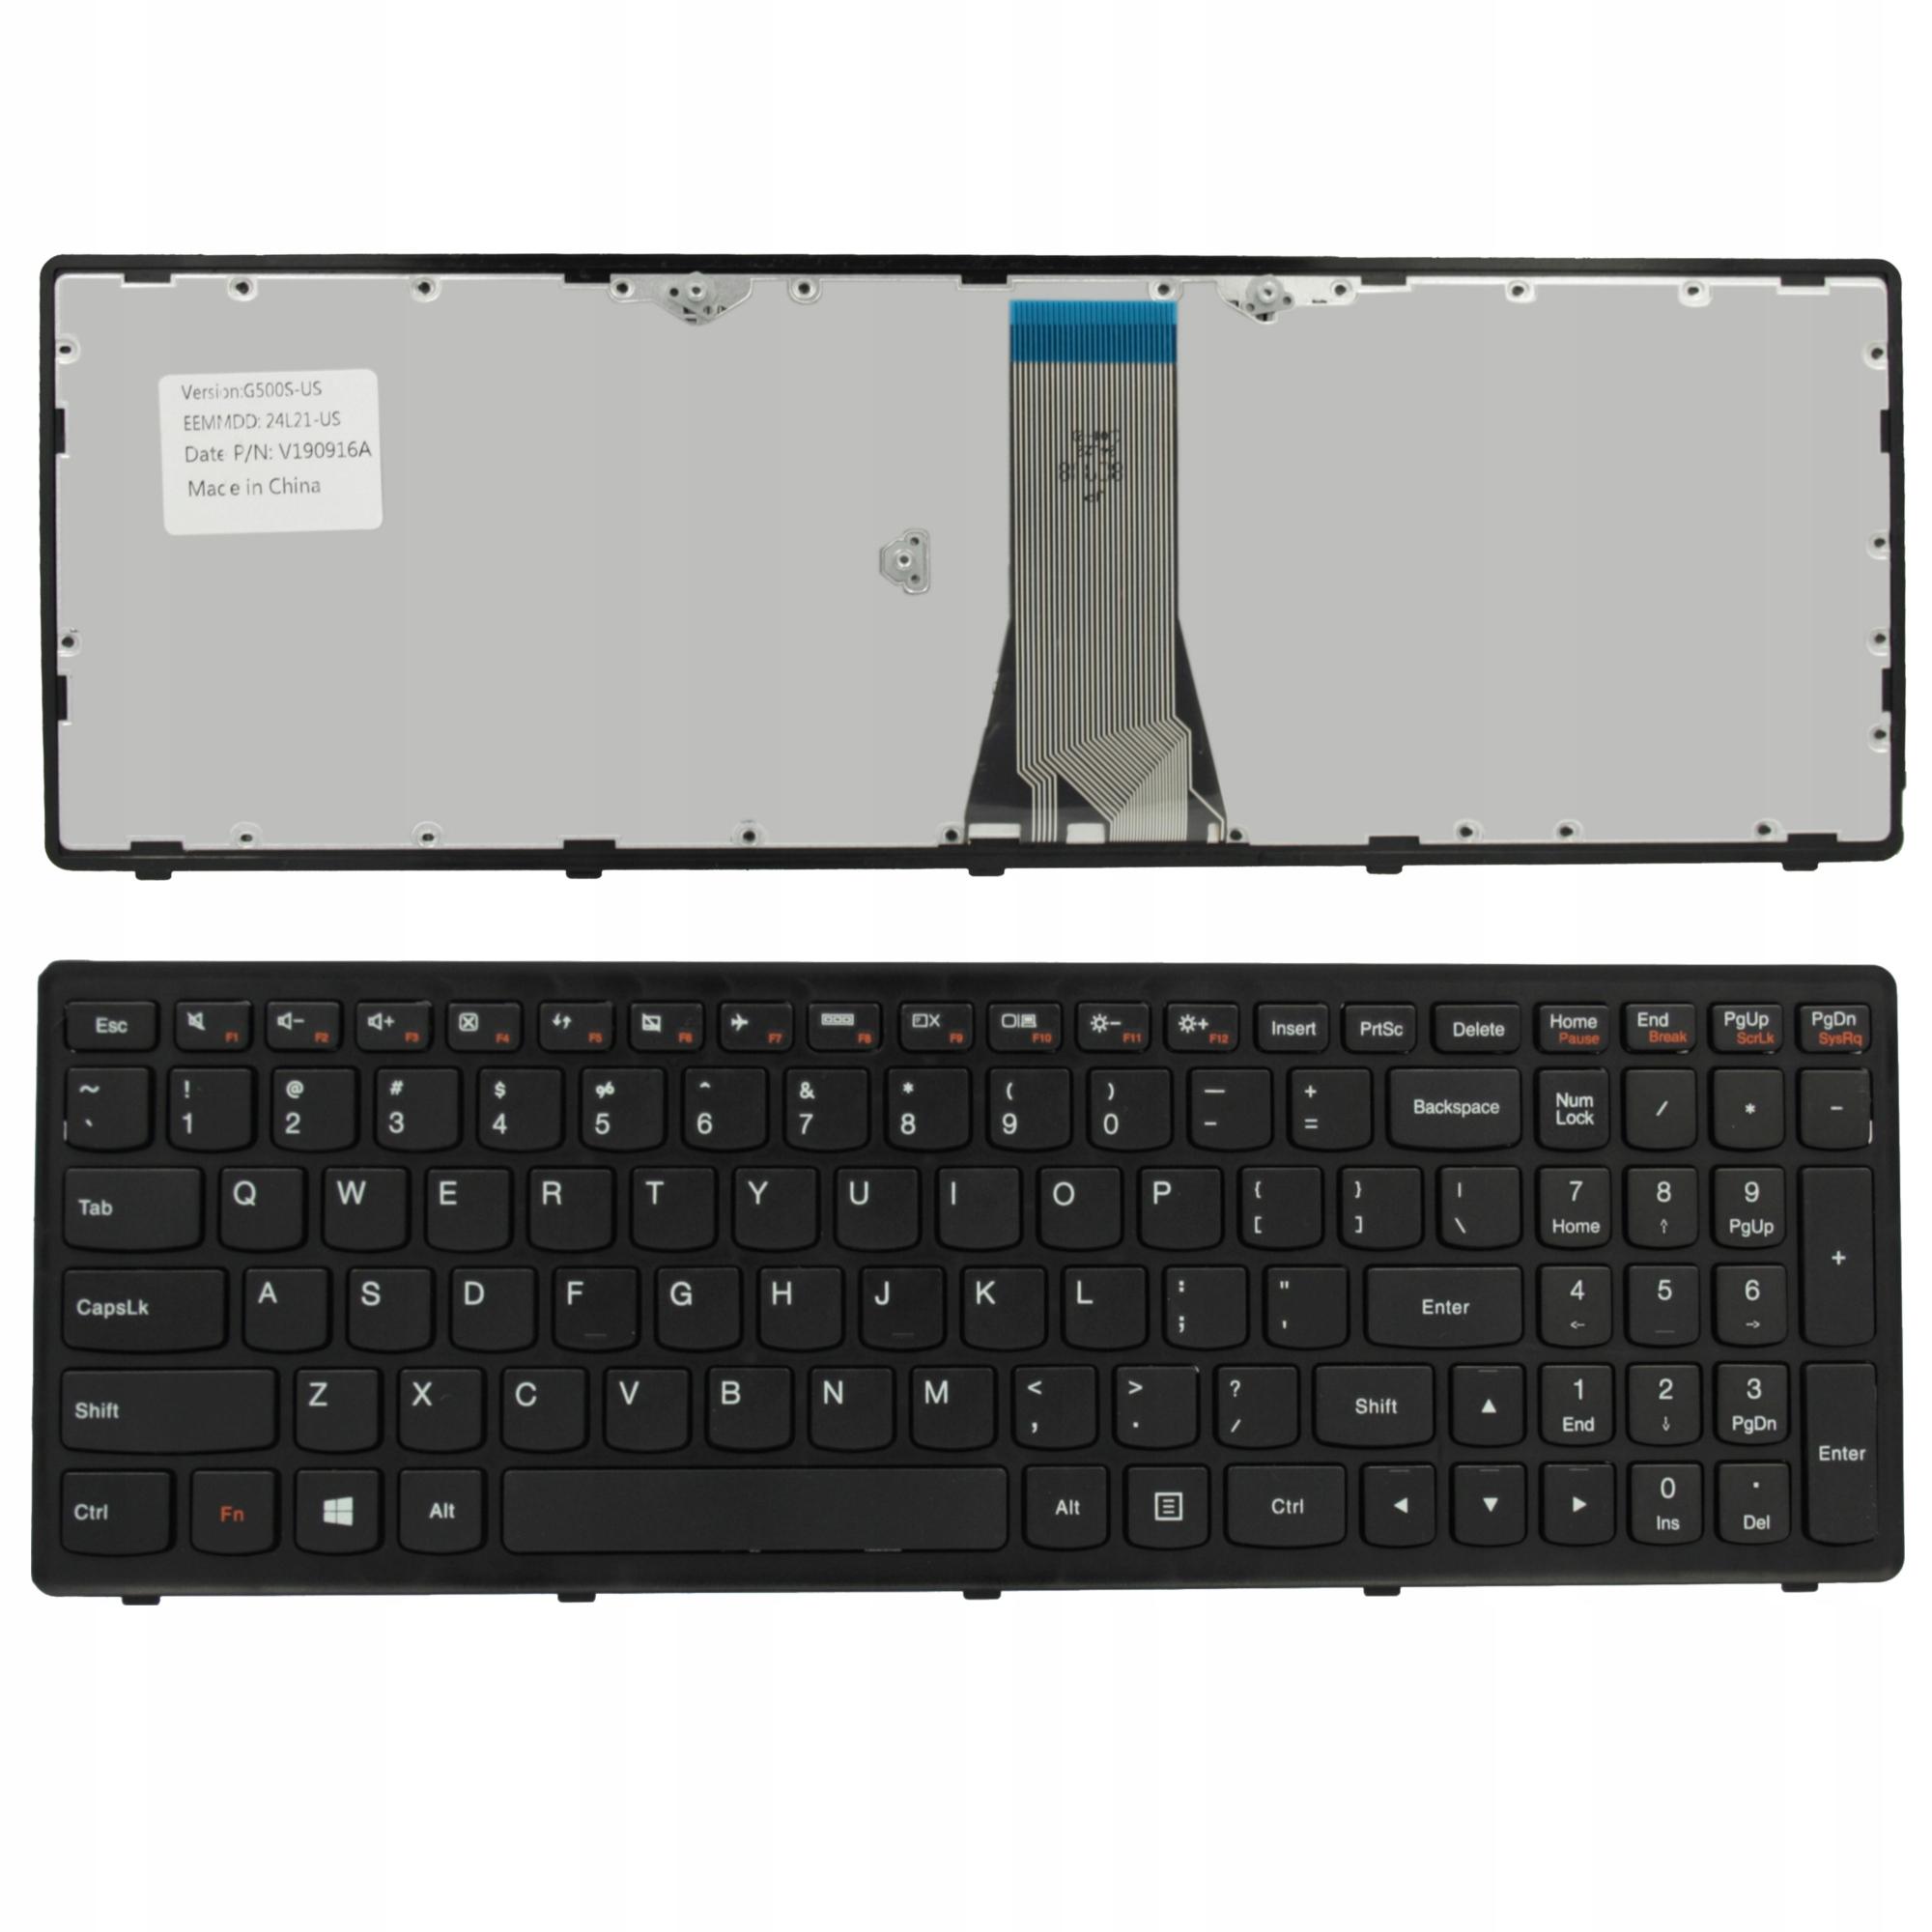 KLAWIATURA IBM LENOVO G500S G505S S500 G510S FLEX 15 - Klawiatury do laptopów